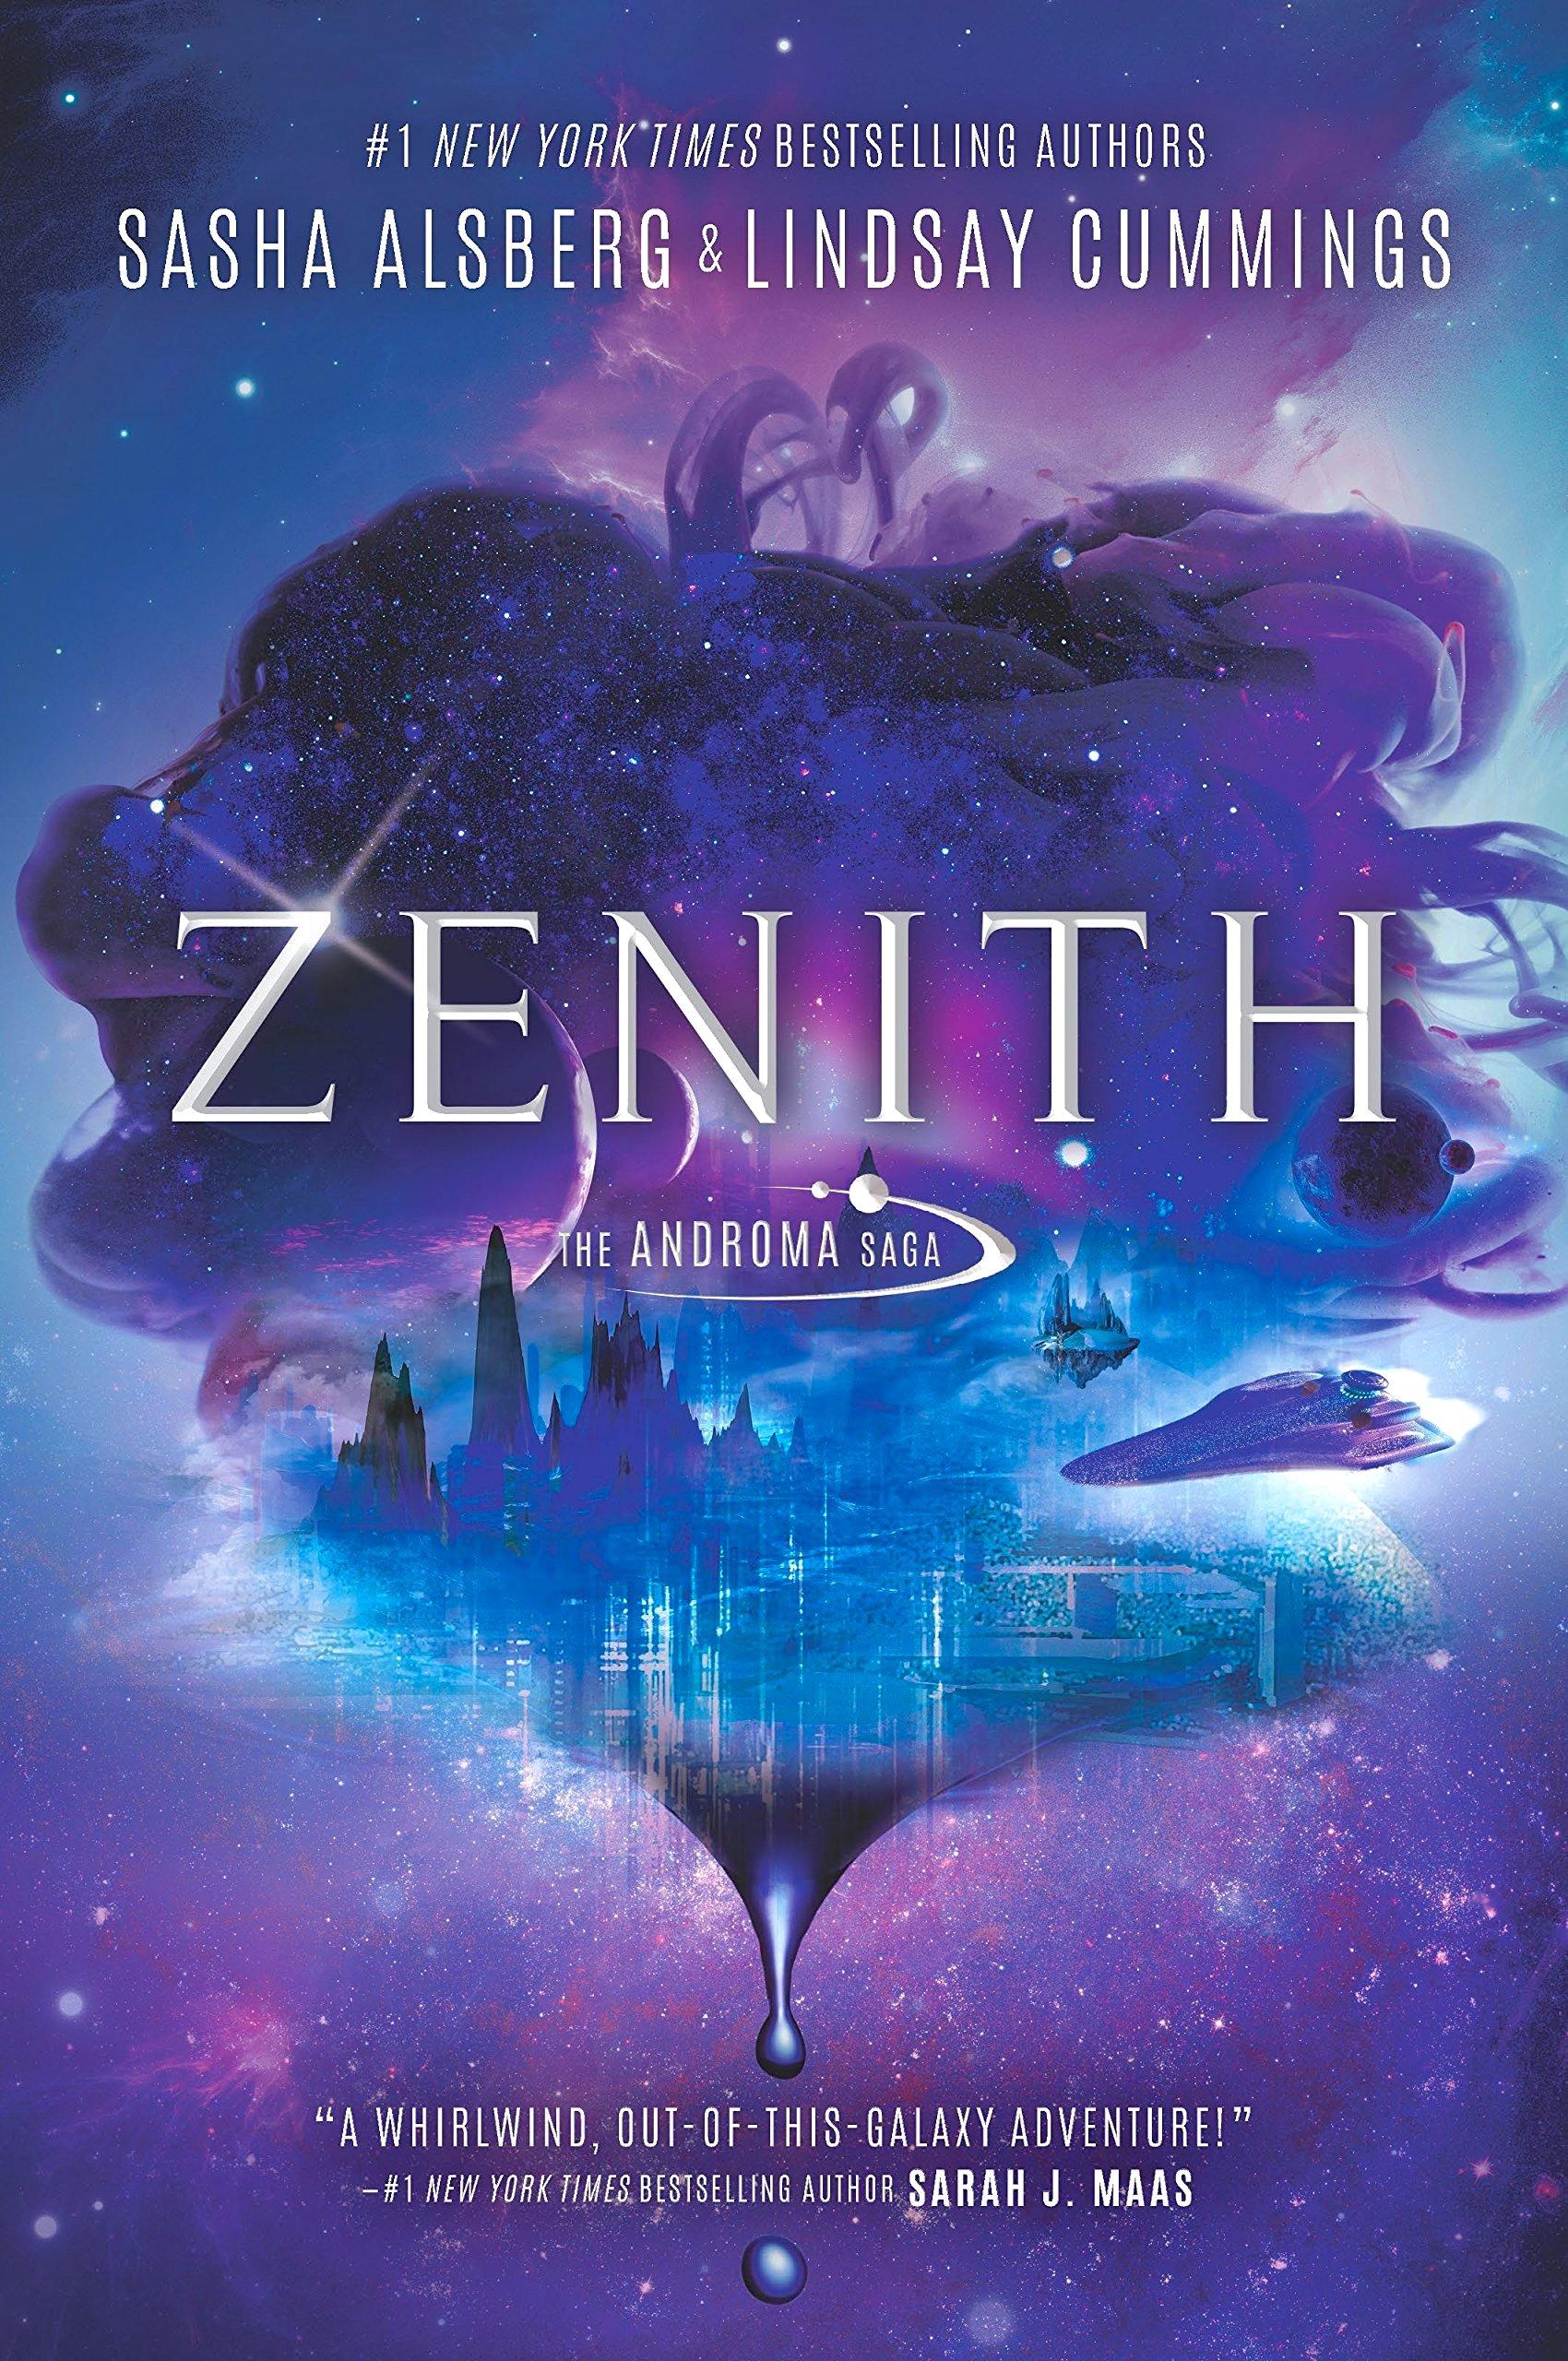 Zenith   The Androma Saga Wiki   FANDOM powered by Wikia